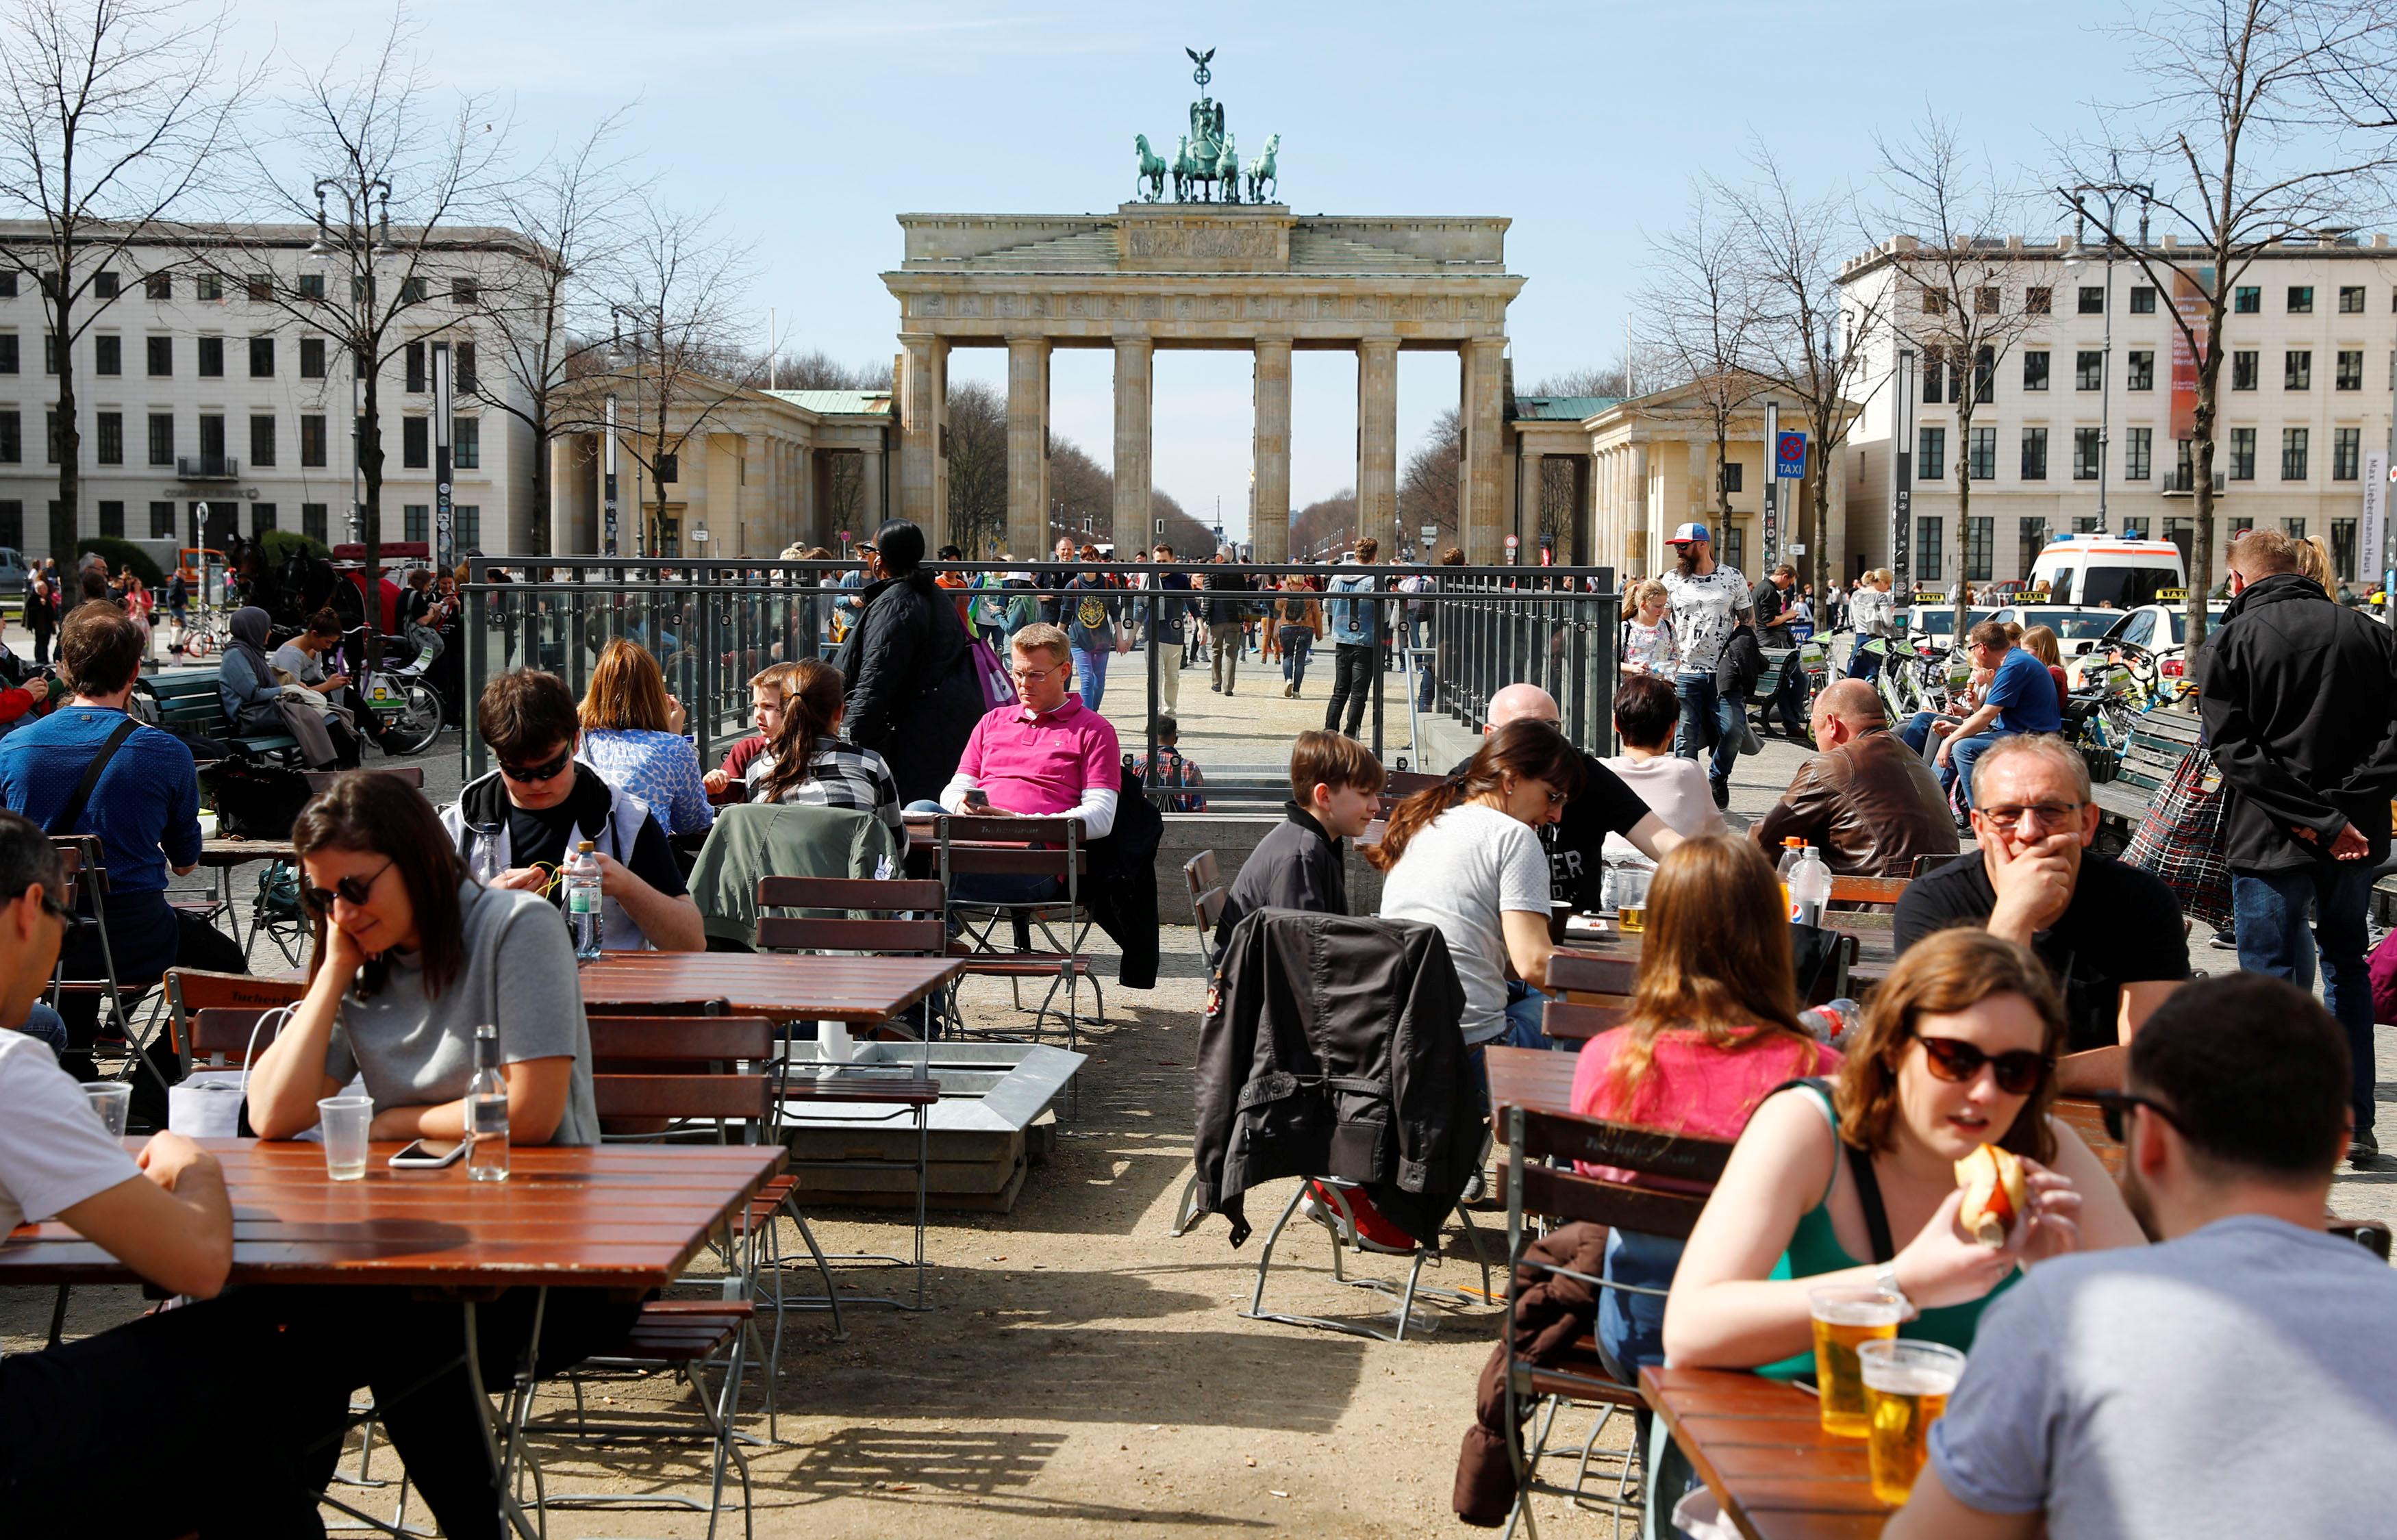 People enjoy sunny weather at the Brandenburg Gate in Berlin